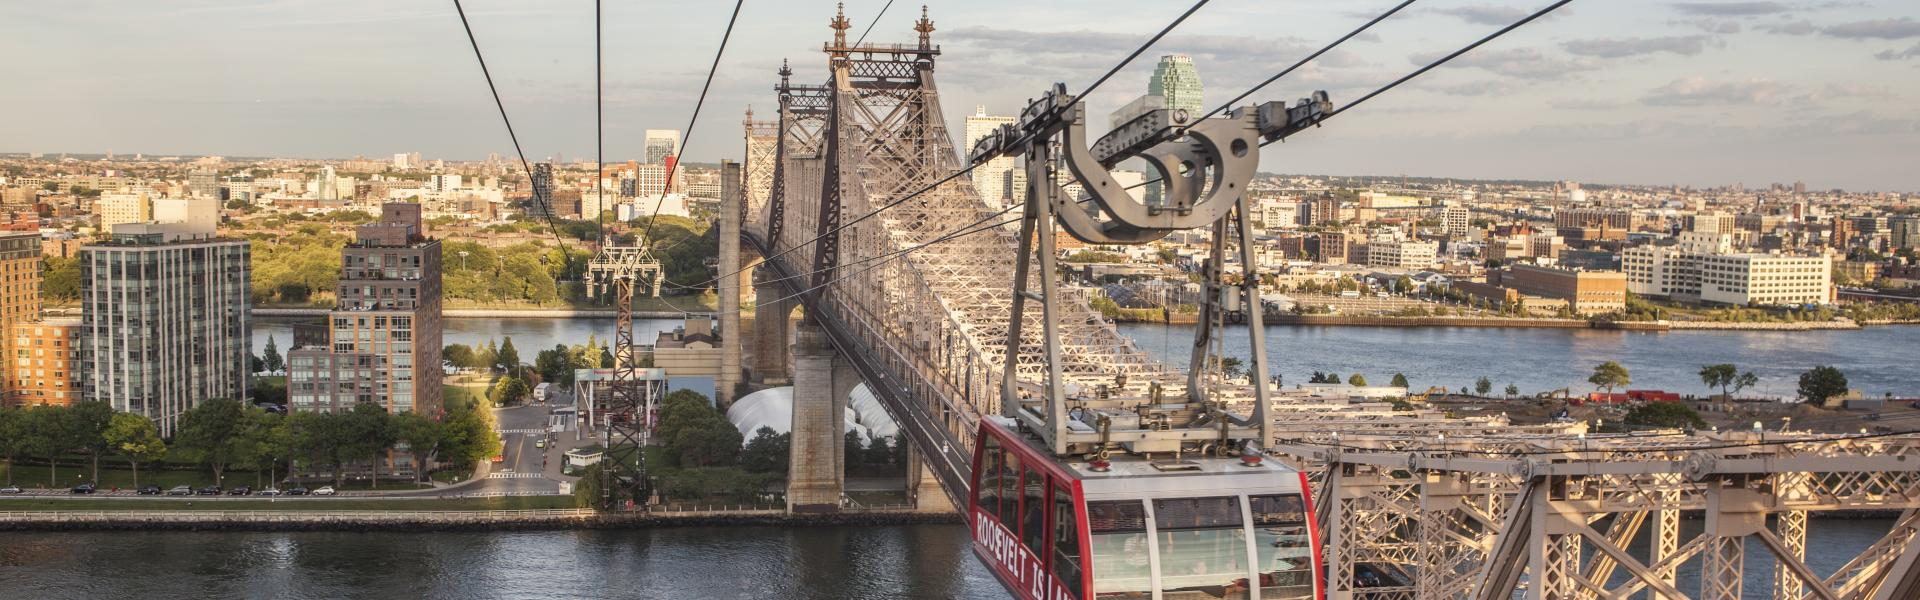 RooseveltIslandTramway_RooseveltIsland_Manhattan_NYC_TaggerYanceyIV_6447